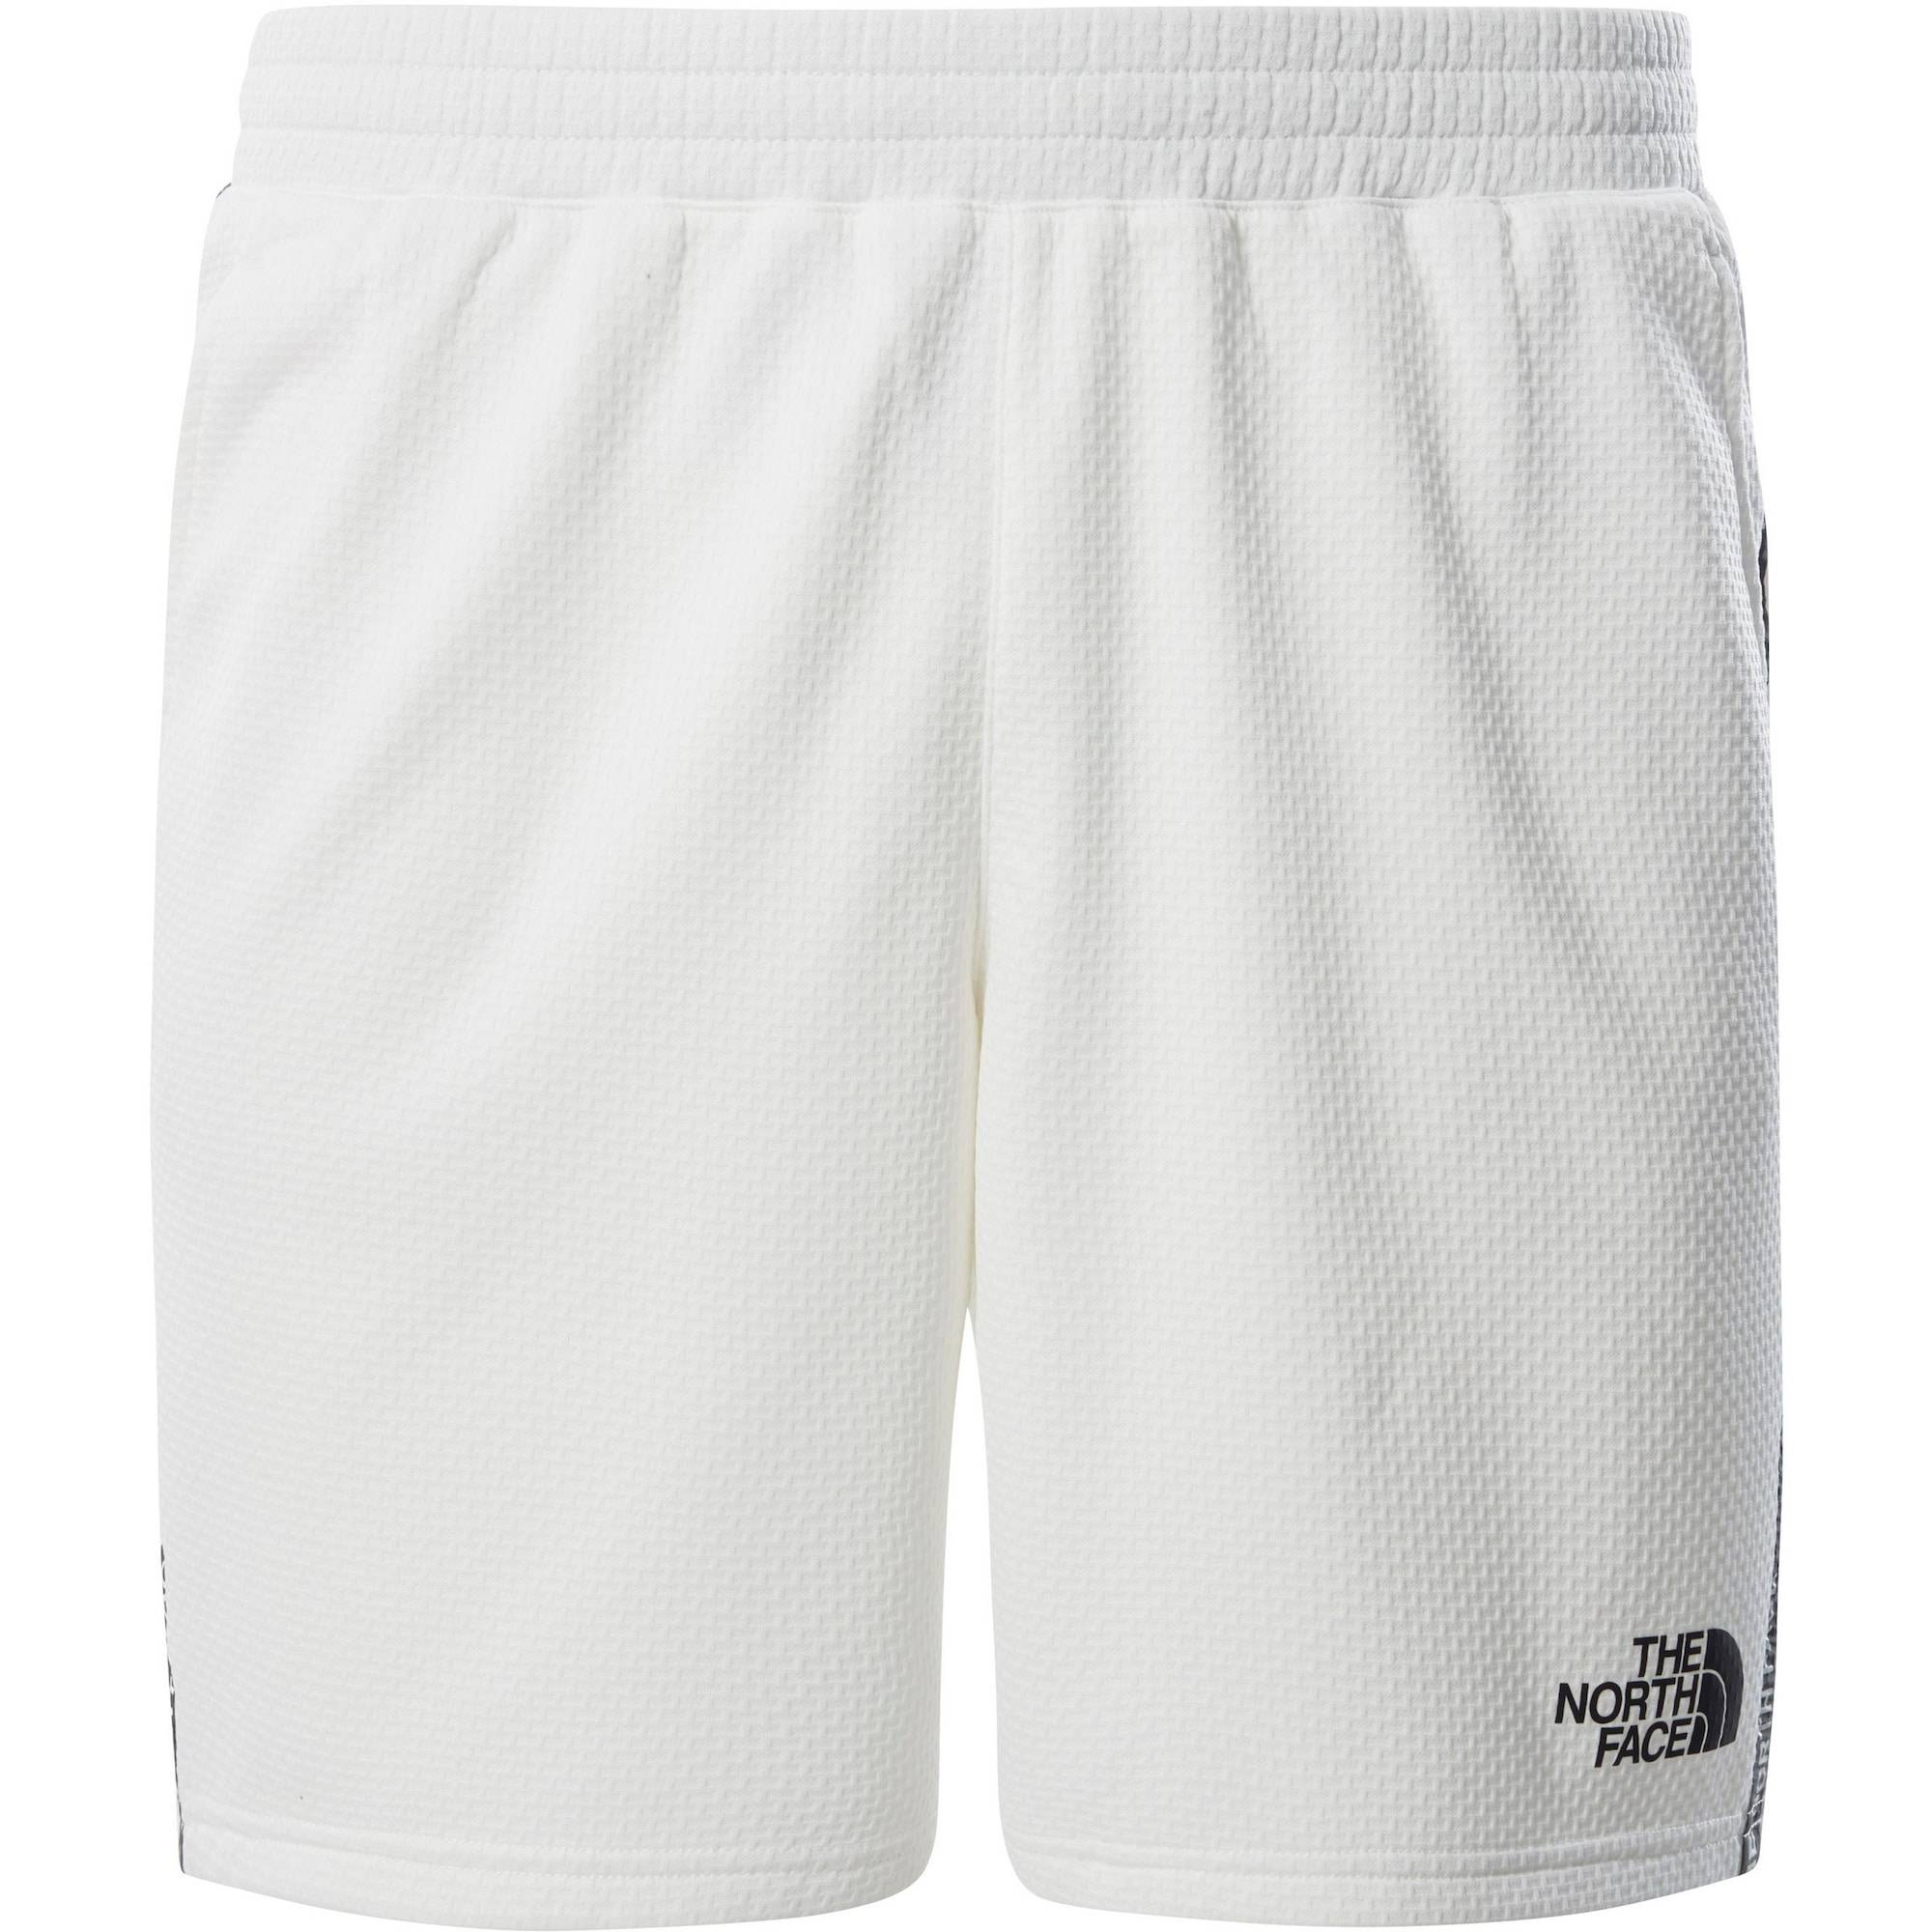 THE NORTH FACE Pantalon de sport 'Train'  - Blanc - Taille: S - male